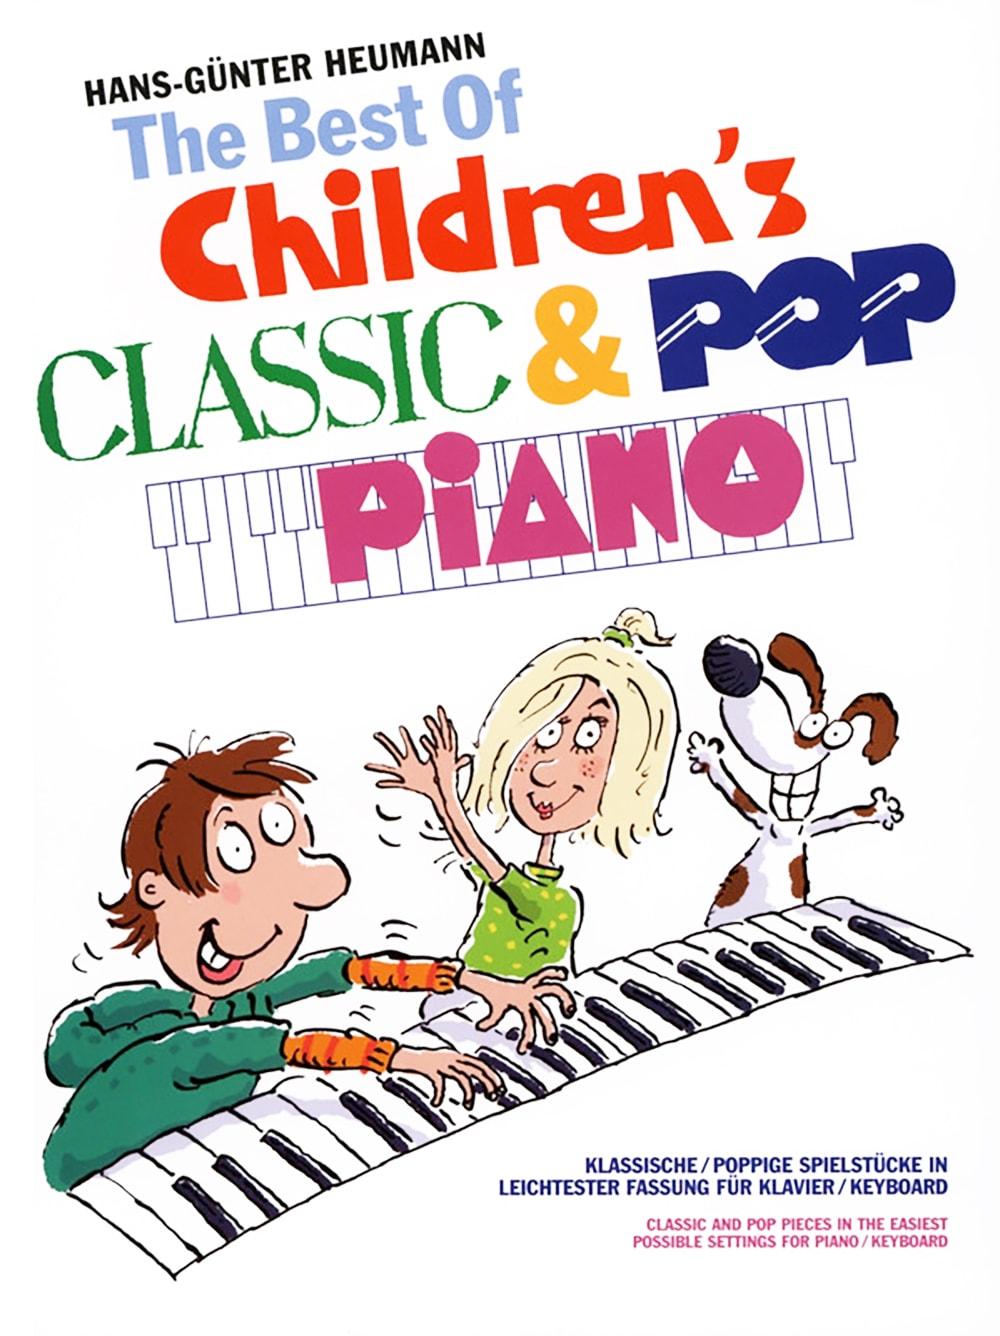 The Best Of Children's Classic & Pop Piano: Klassische und poppige Spielstücke